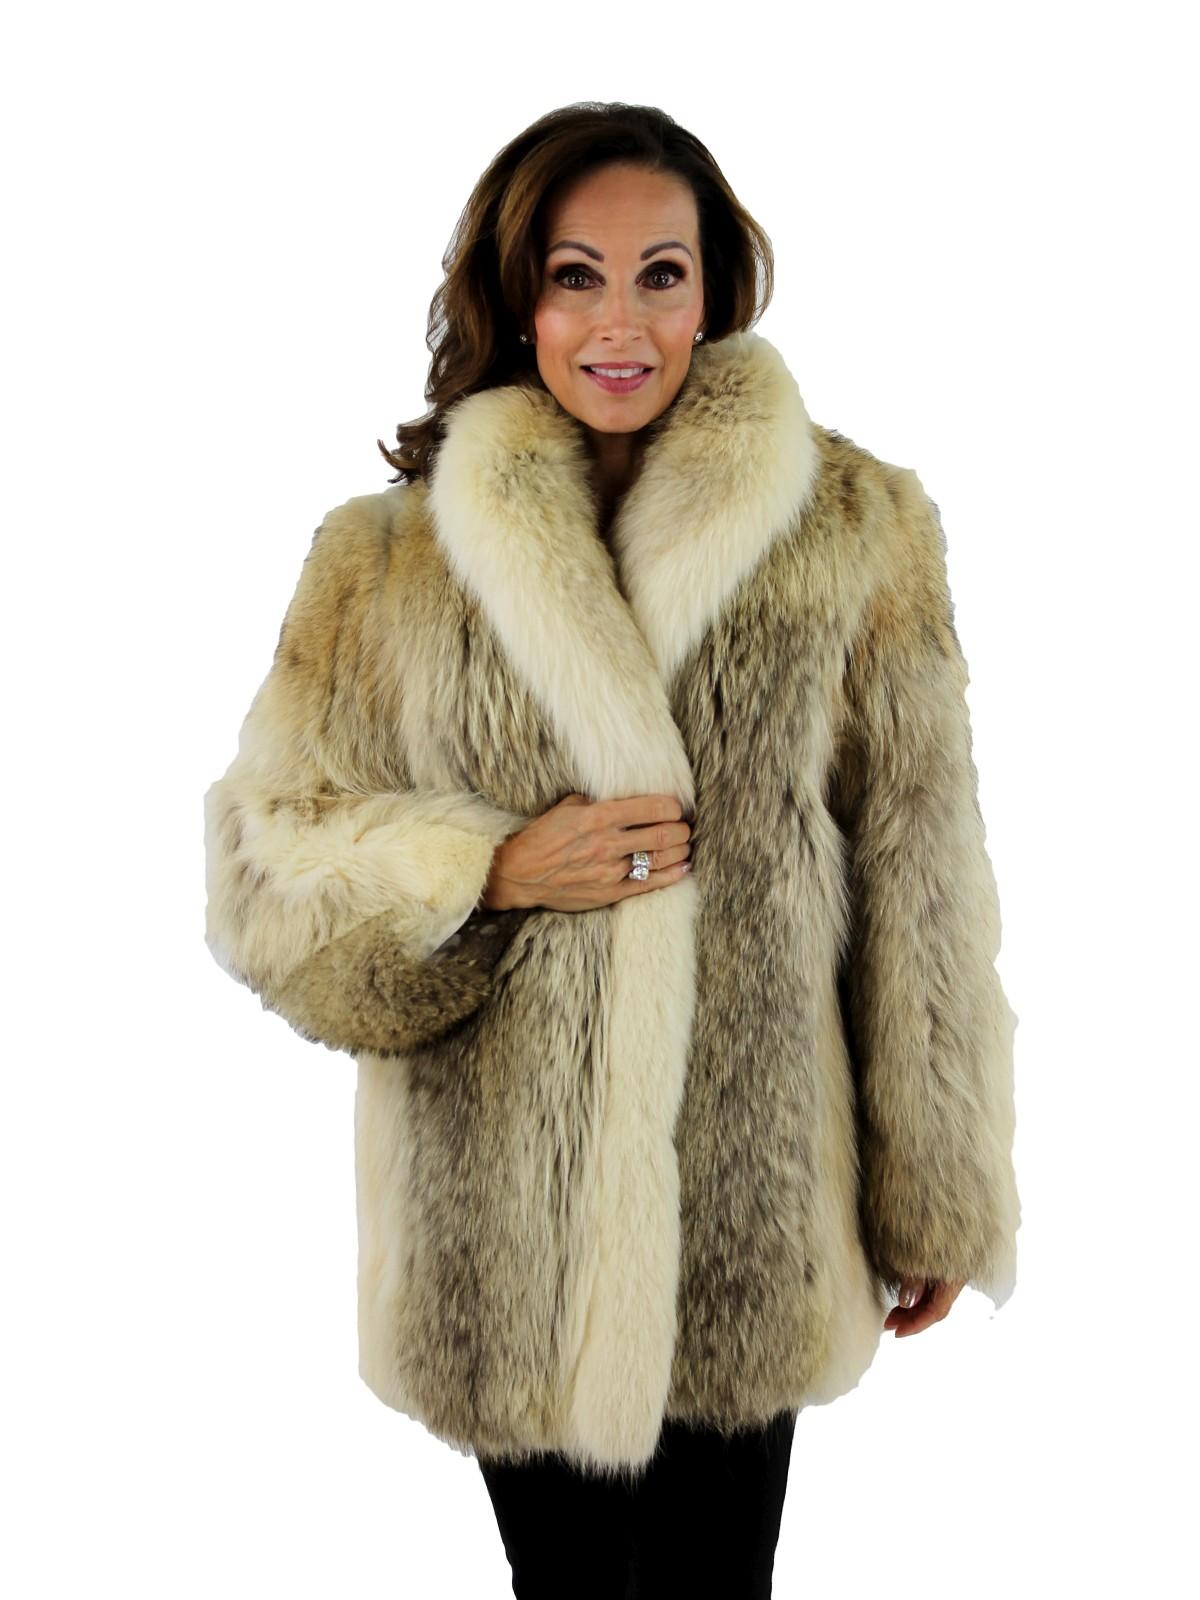 Coyote Fur Coat >> Women S Fur Coyote Jacket With Shadow Fox Tuxedo Front Women S Small Estate Furs